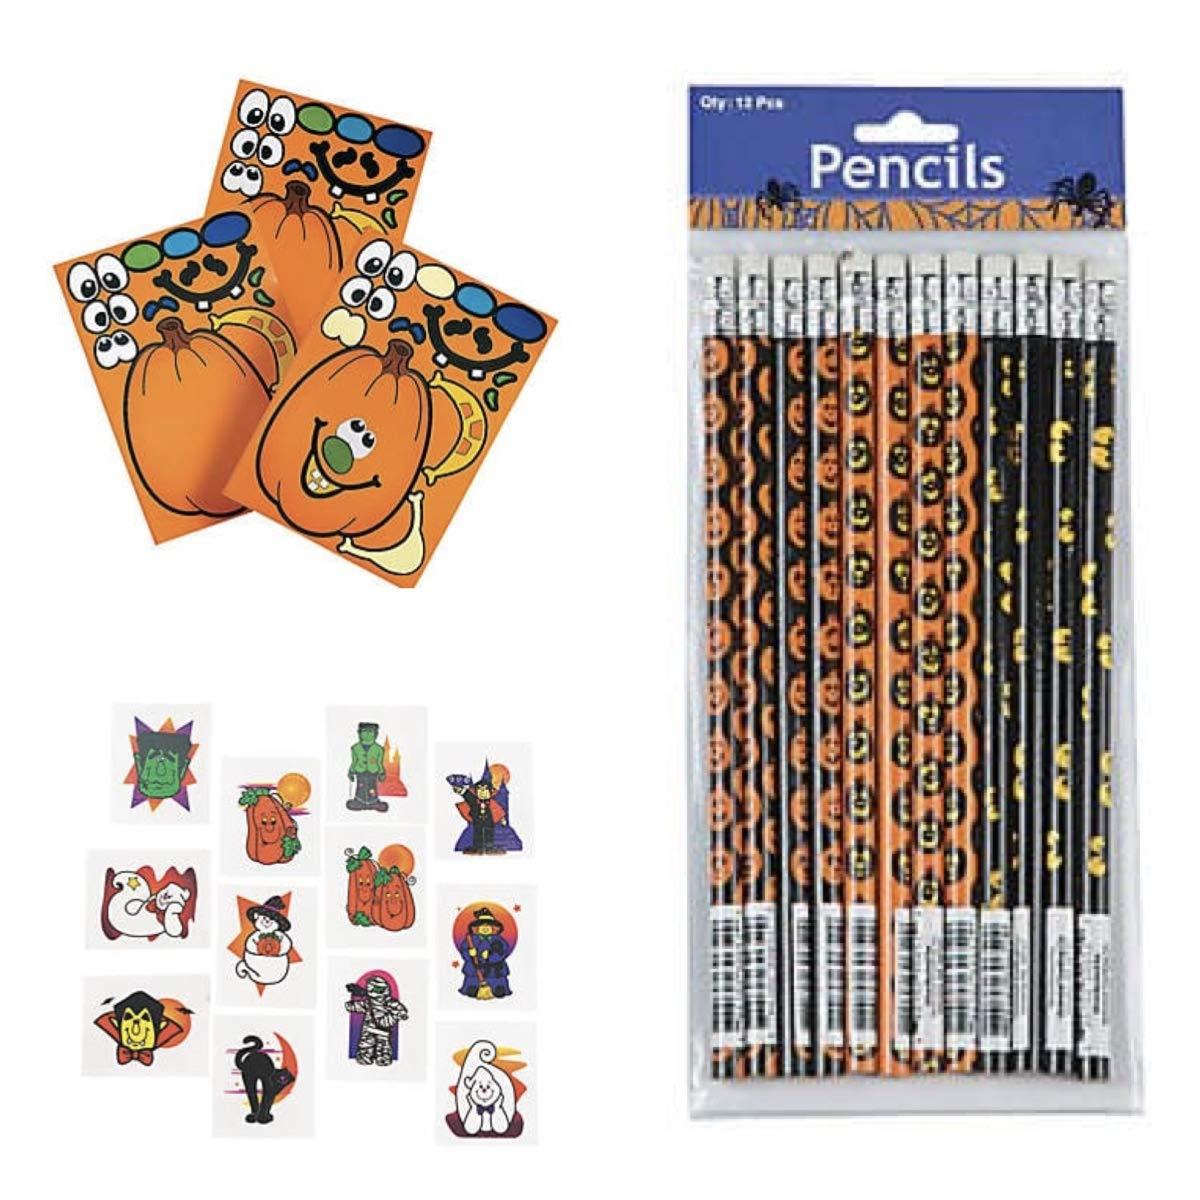 120 Halloween Party Favors - 24 Pencils - 72 Tattoos - 24 Make a Pumpkin Sticker Scenes - Teacher Supplies Classroom Rewards Jack O'Lantern - Trick or Treat Spooky